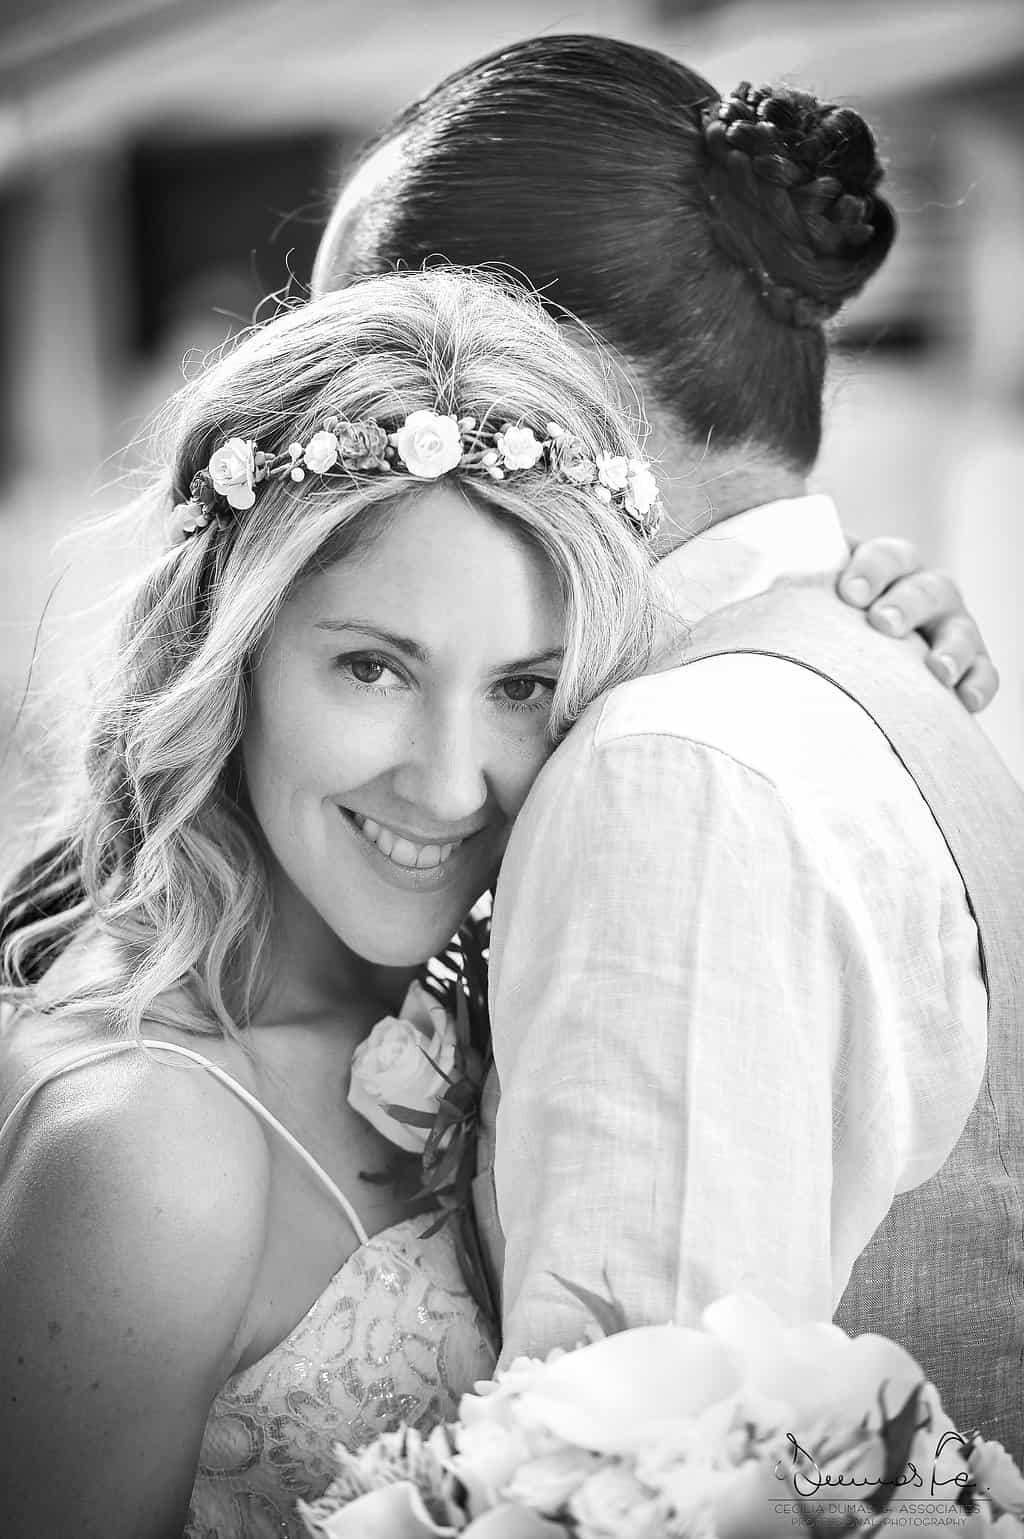 islamujeres-buhos-weddingphotography-heathermel25